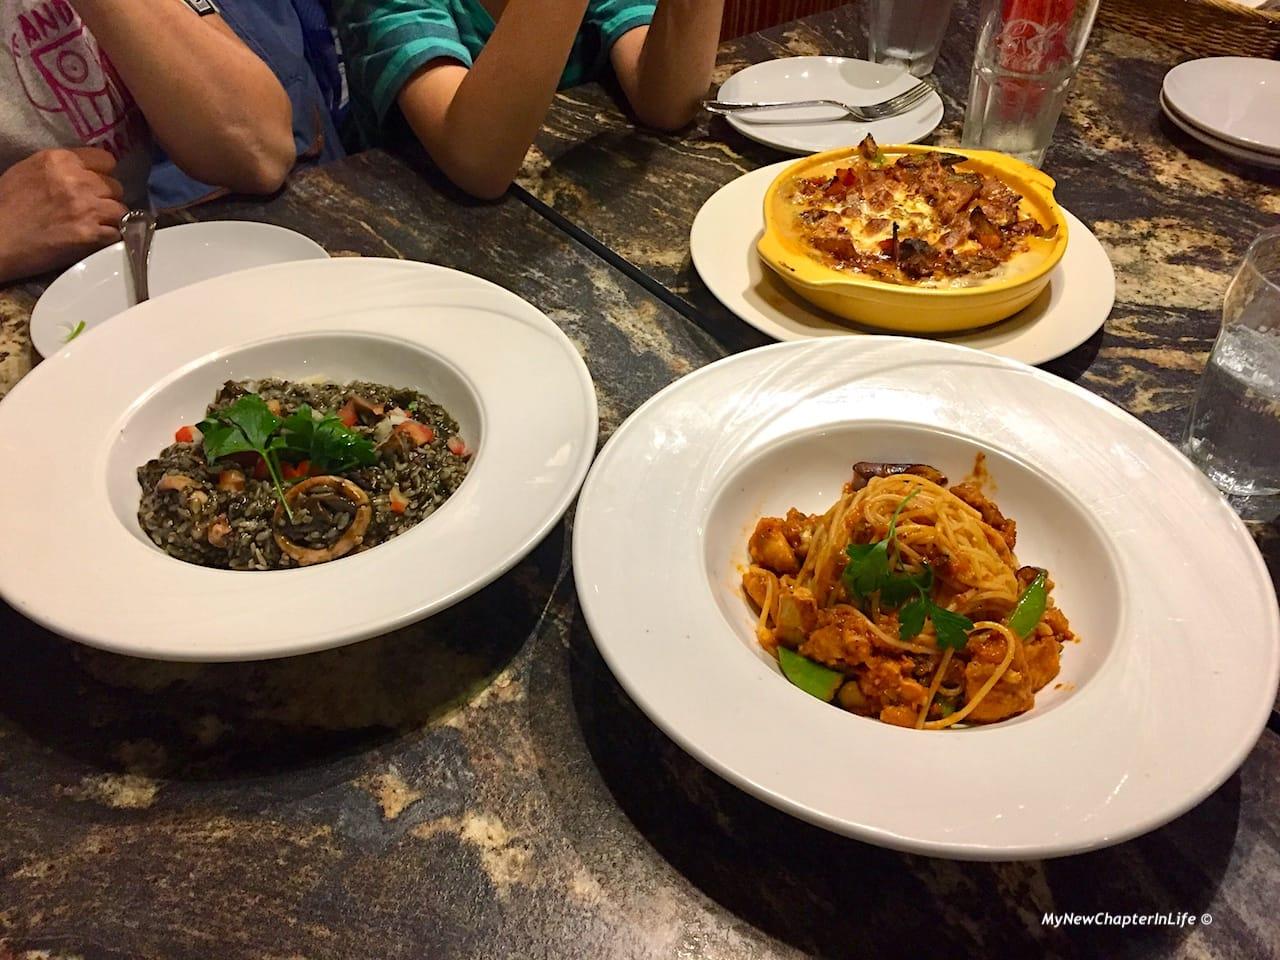 烏賊墨燉飯,辣味蕃茄雞肉義大利圓麵,波隆納肉醬焗斜管麵 Grazie Squid Ink Risotto, Spaghetti Arrabiata with Chick and Penne Cheese Gratin with Meat